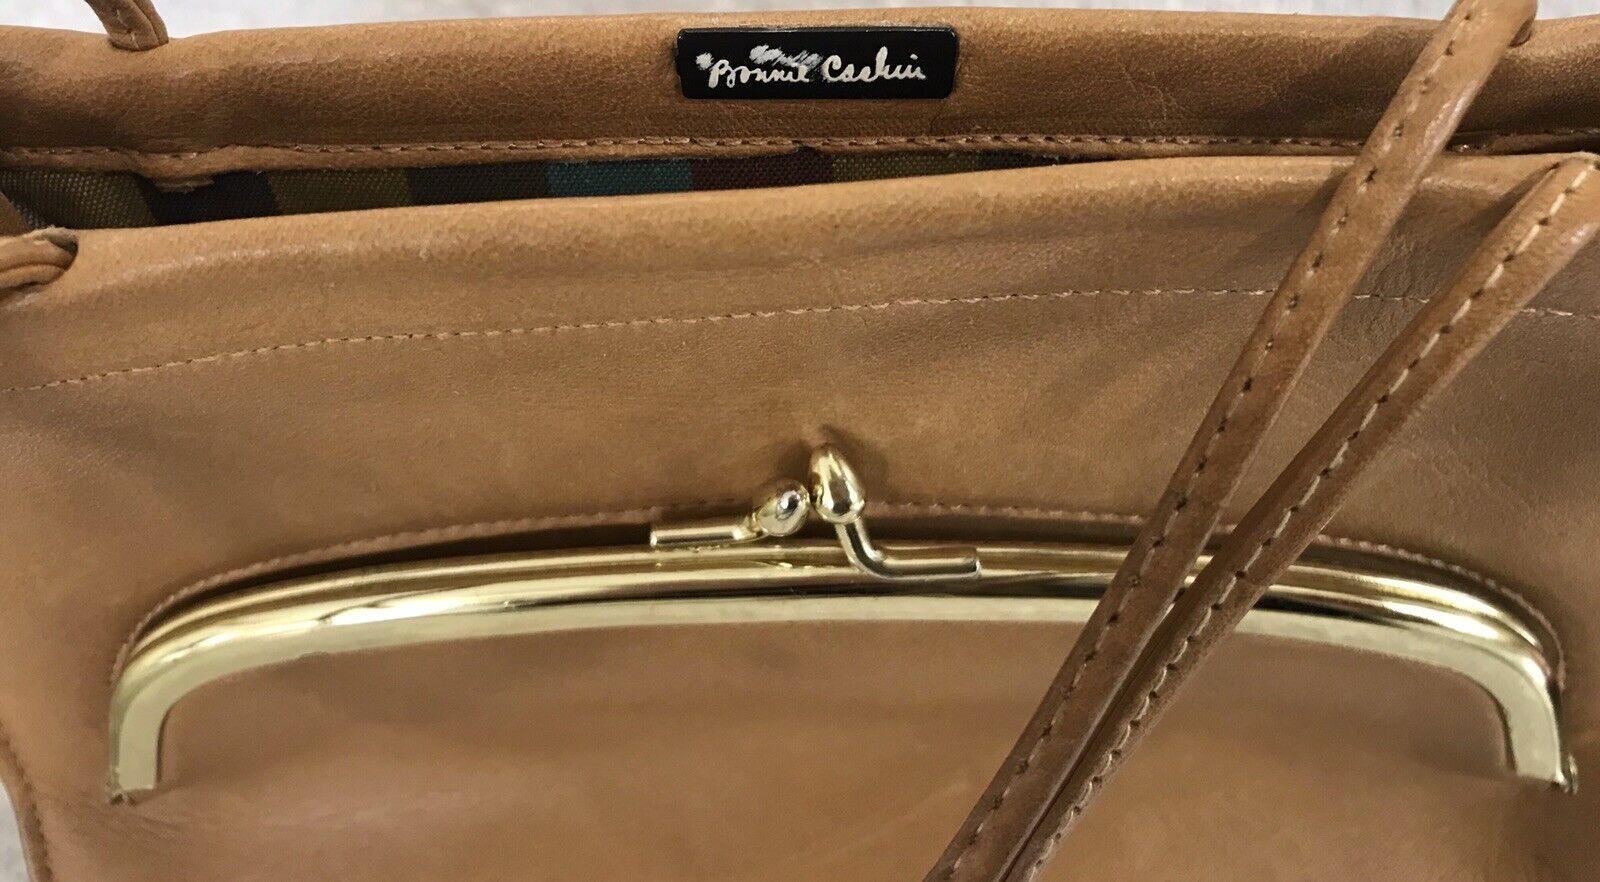 Vintage Coach Rare Leather Bonnie Cashin Stripe I… - image 3